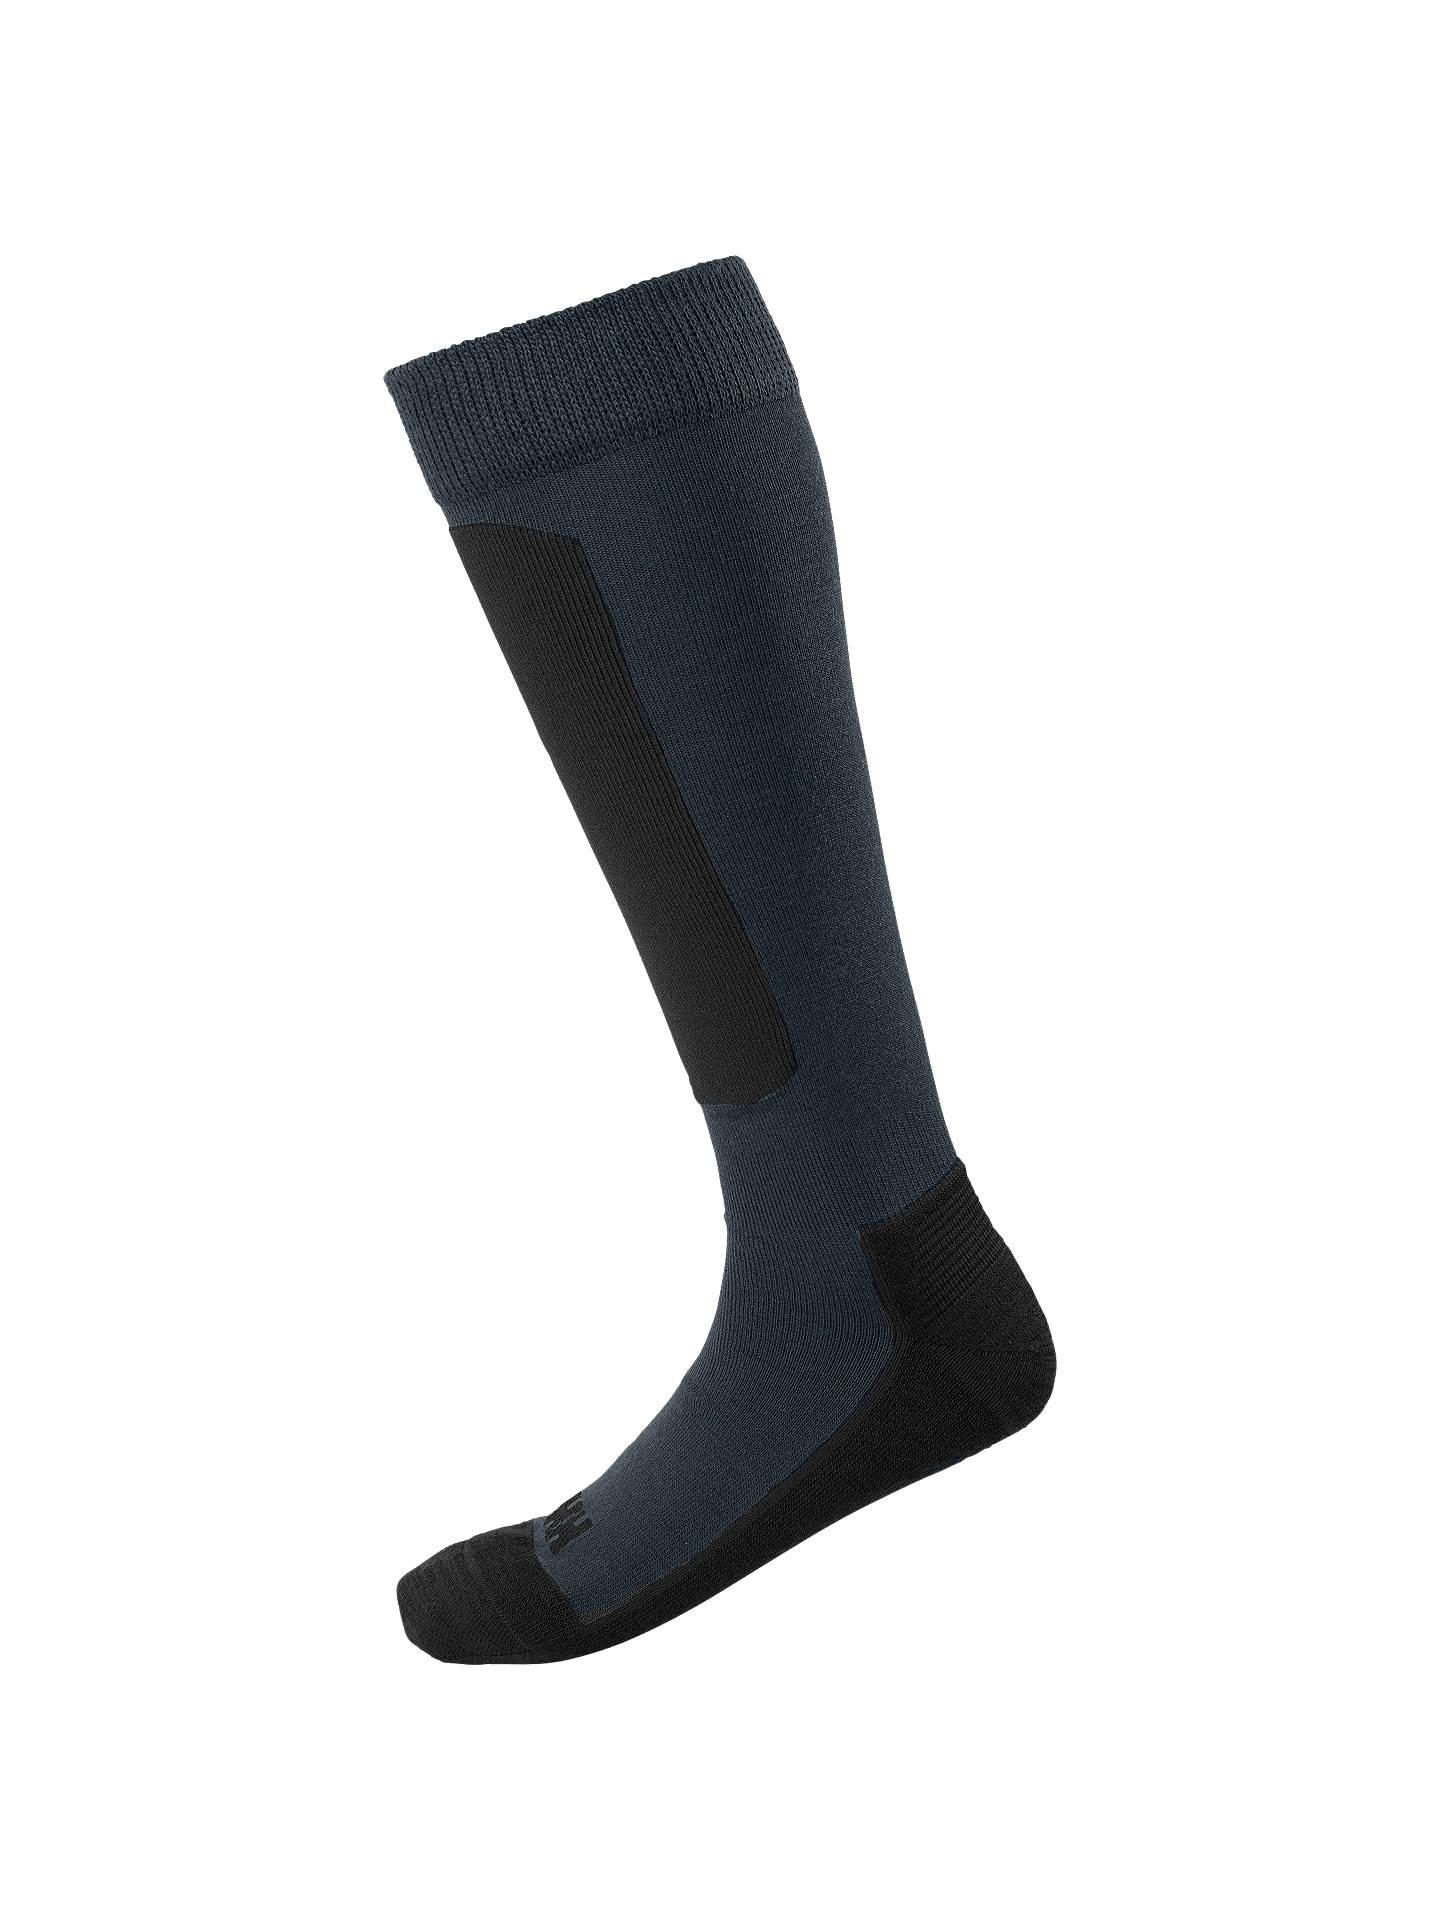 5e7a7fc3 Buy Helly Hansen Lifa Alpine Ski Socks, Graphite Blue, 11-13 Online at